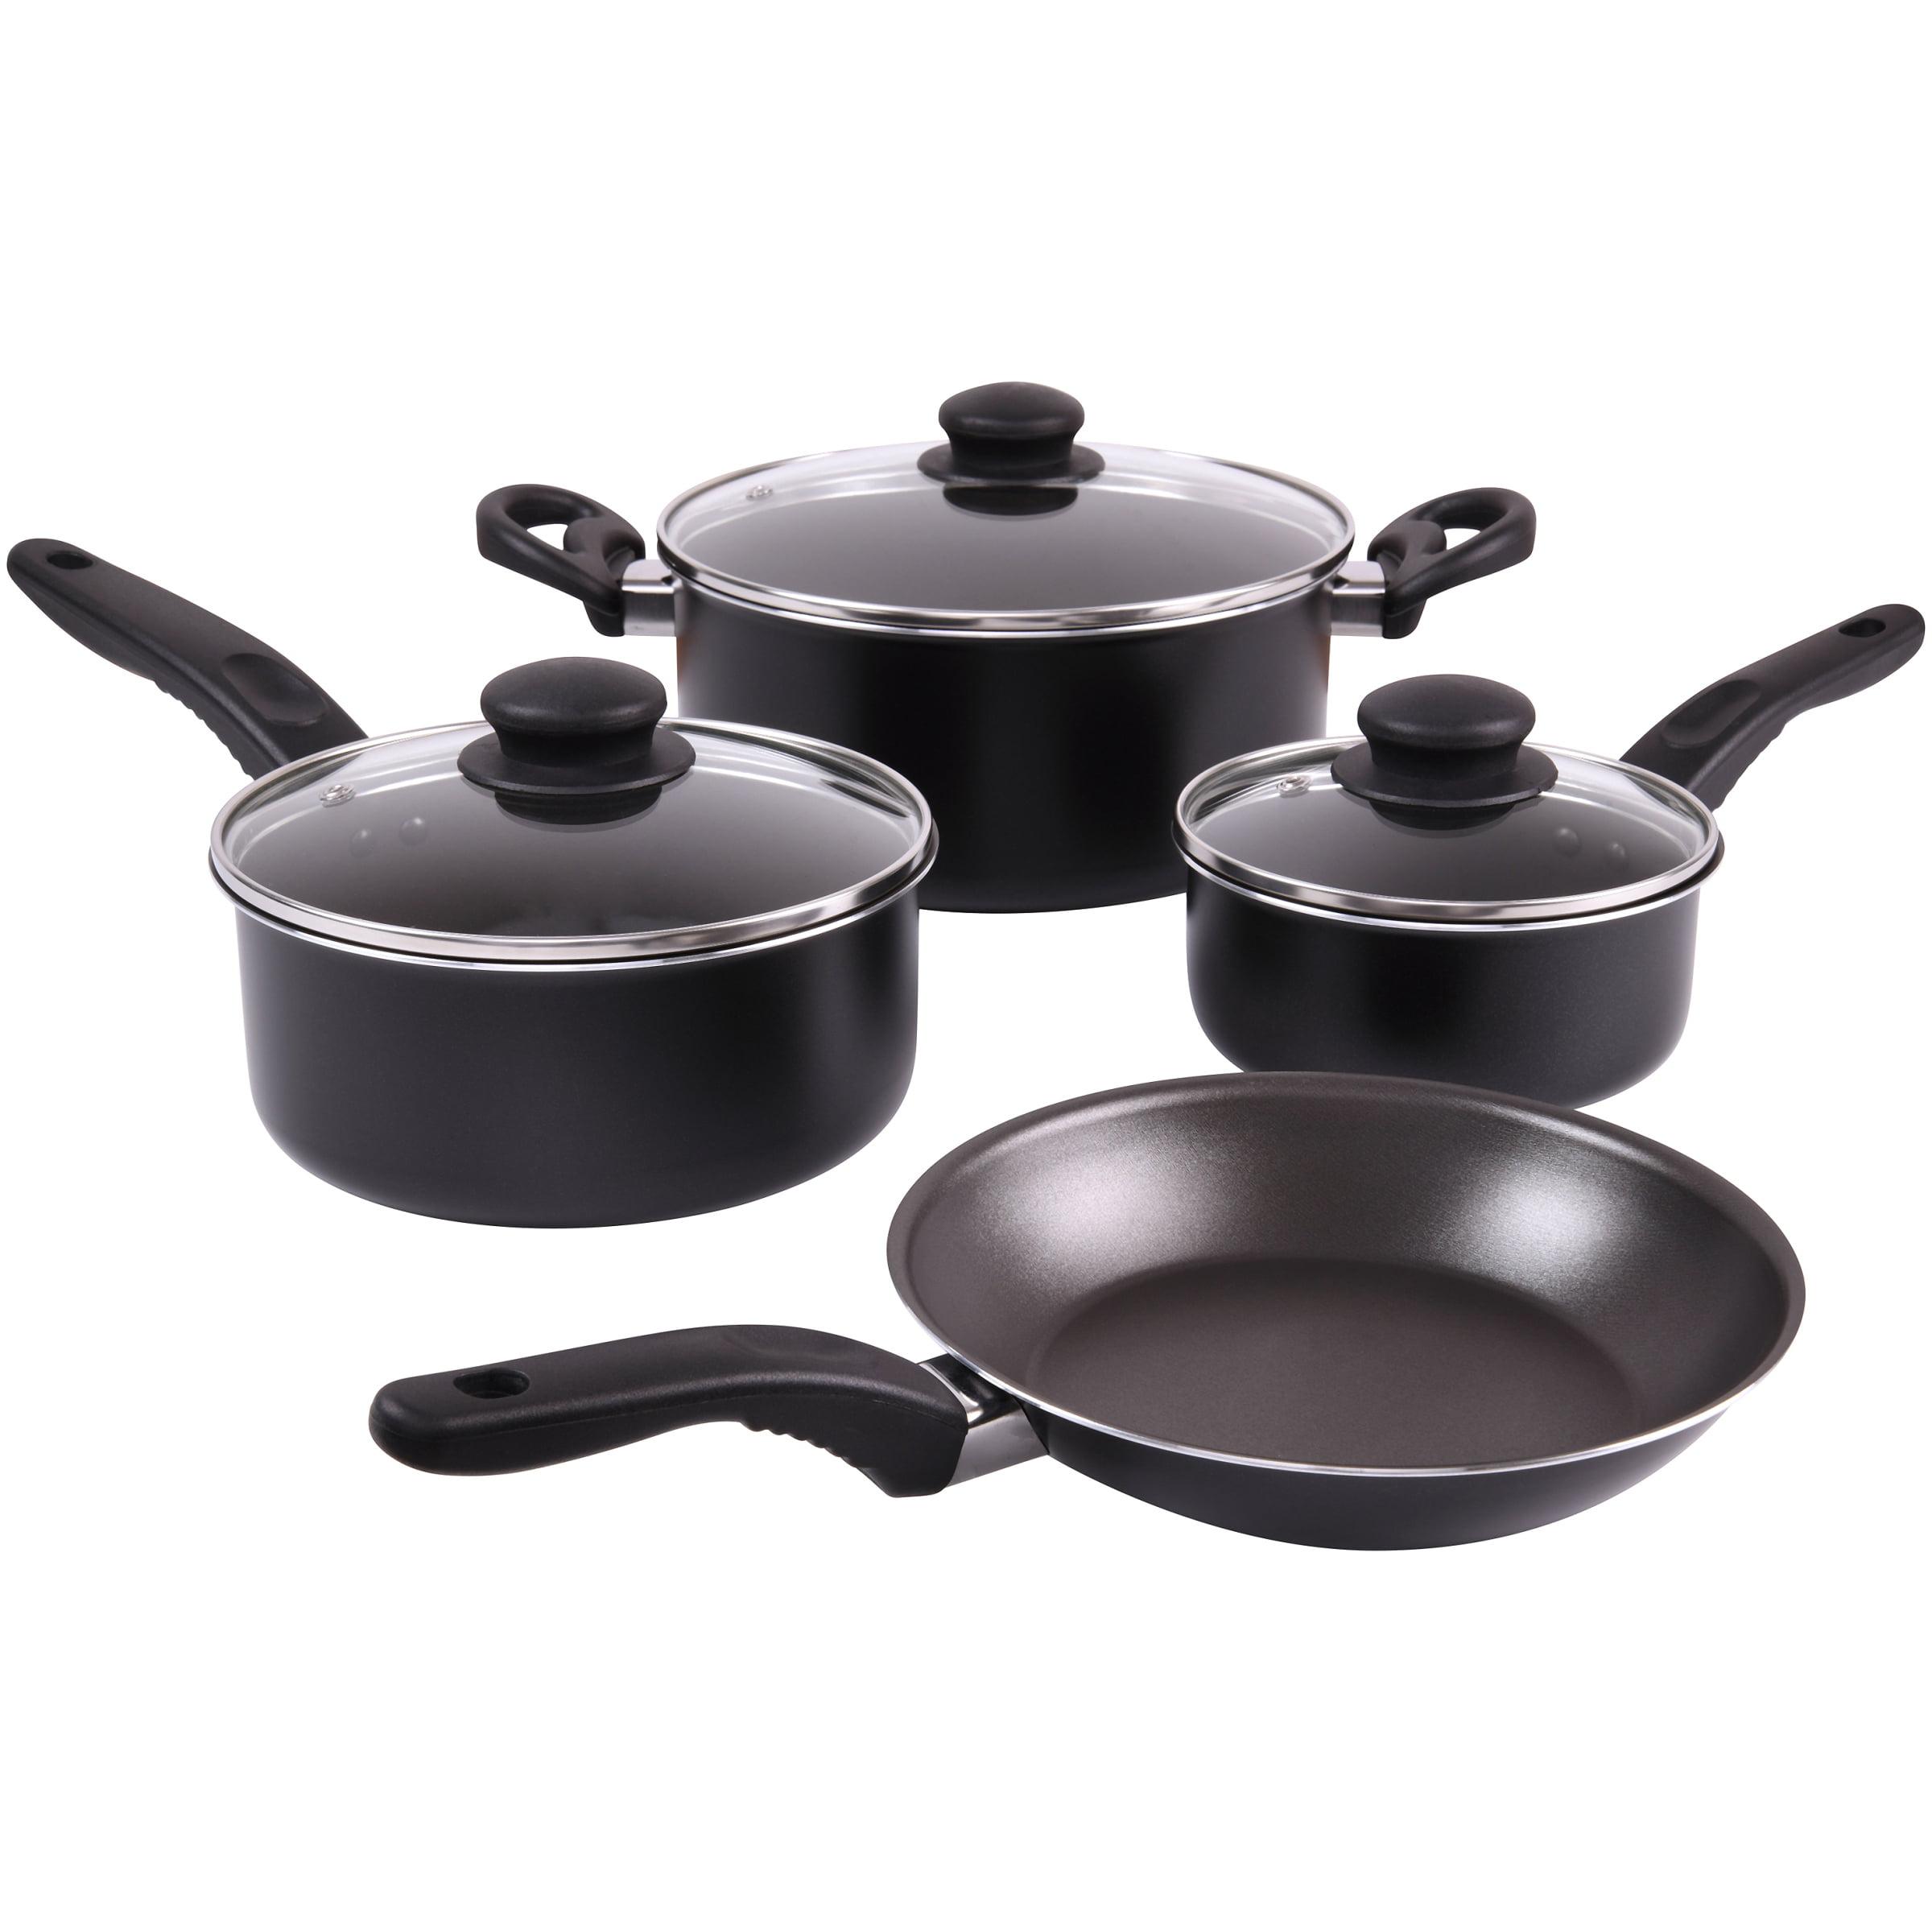 Mainstays 7-Piece Cookware Set Black with Teflon Non-Stick Construction